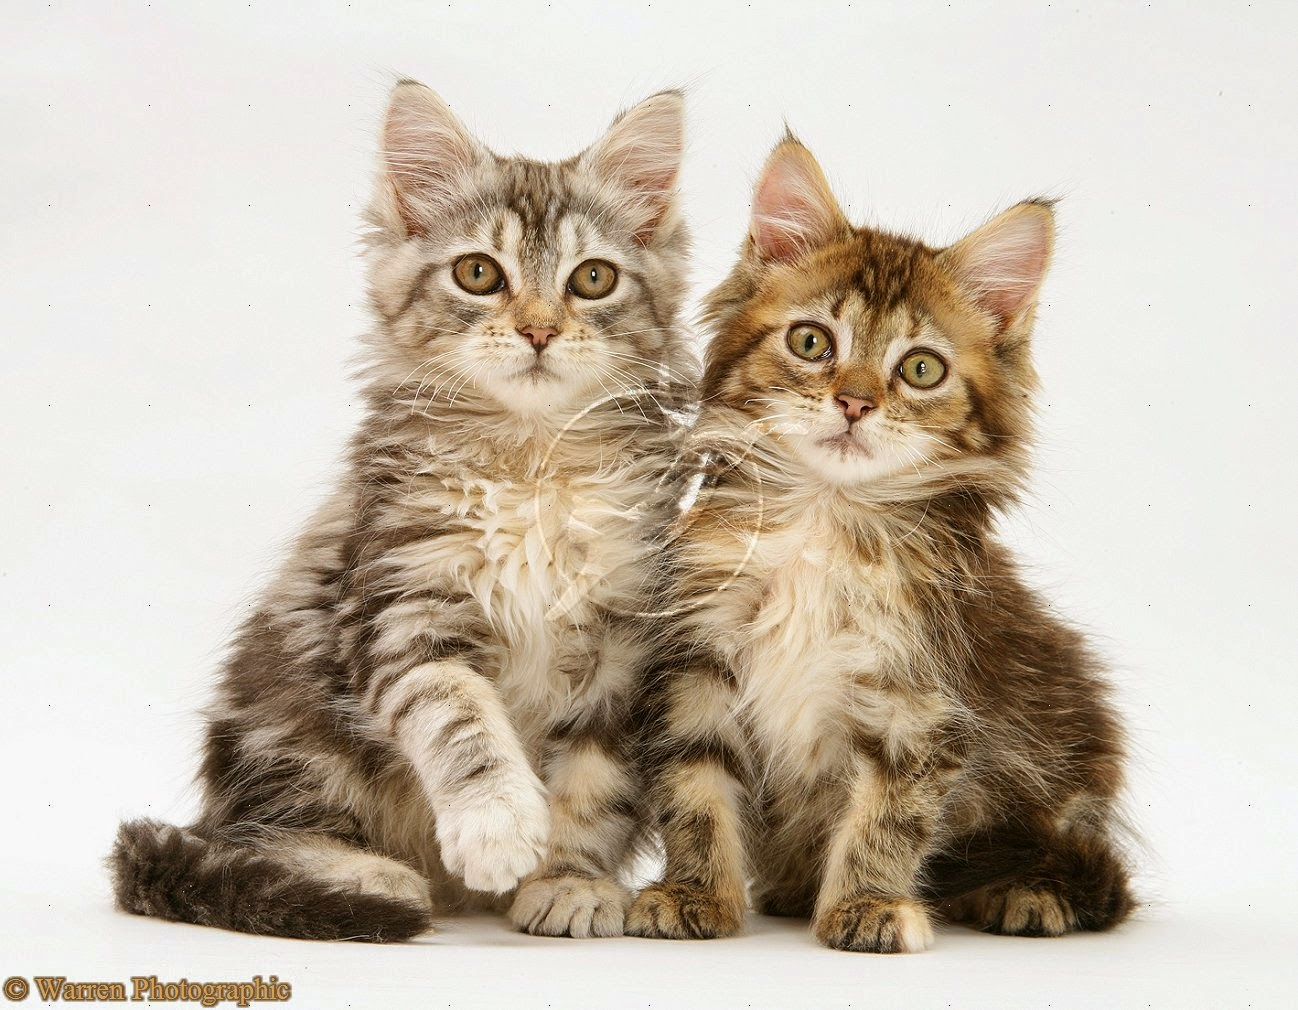 Gambar Kucing Condromowo godean.web.id